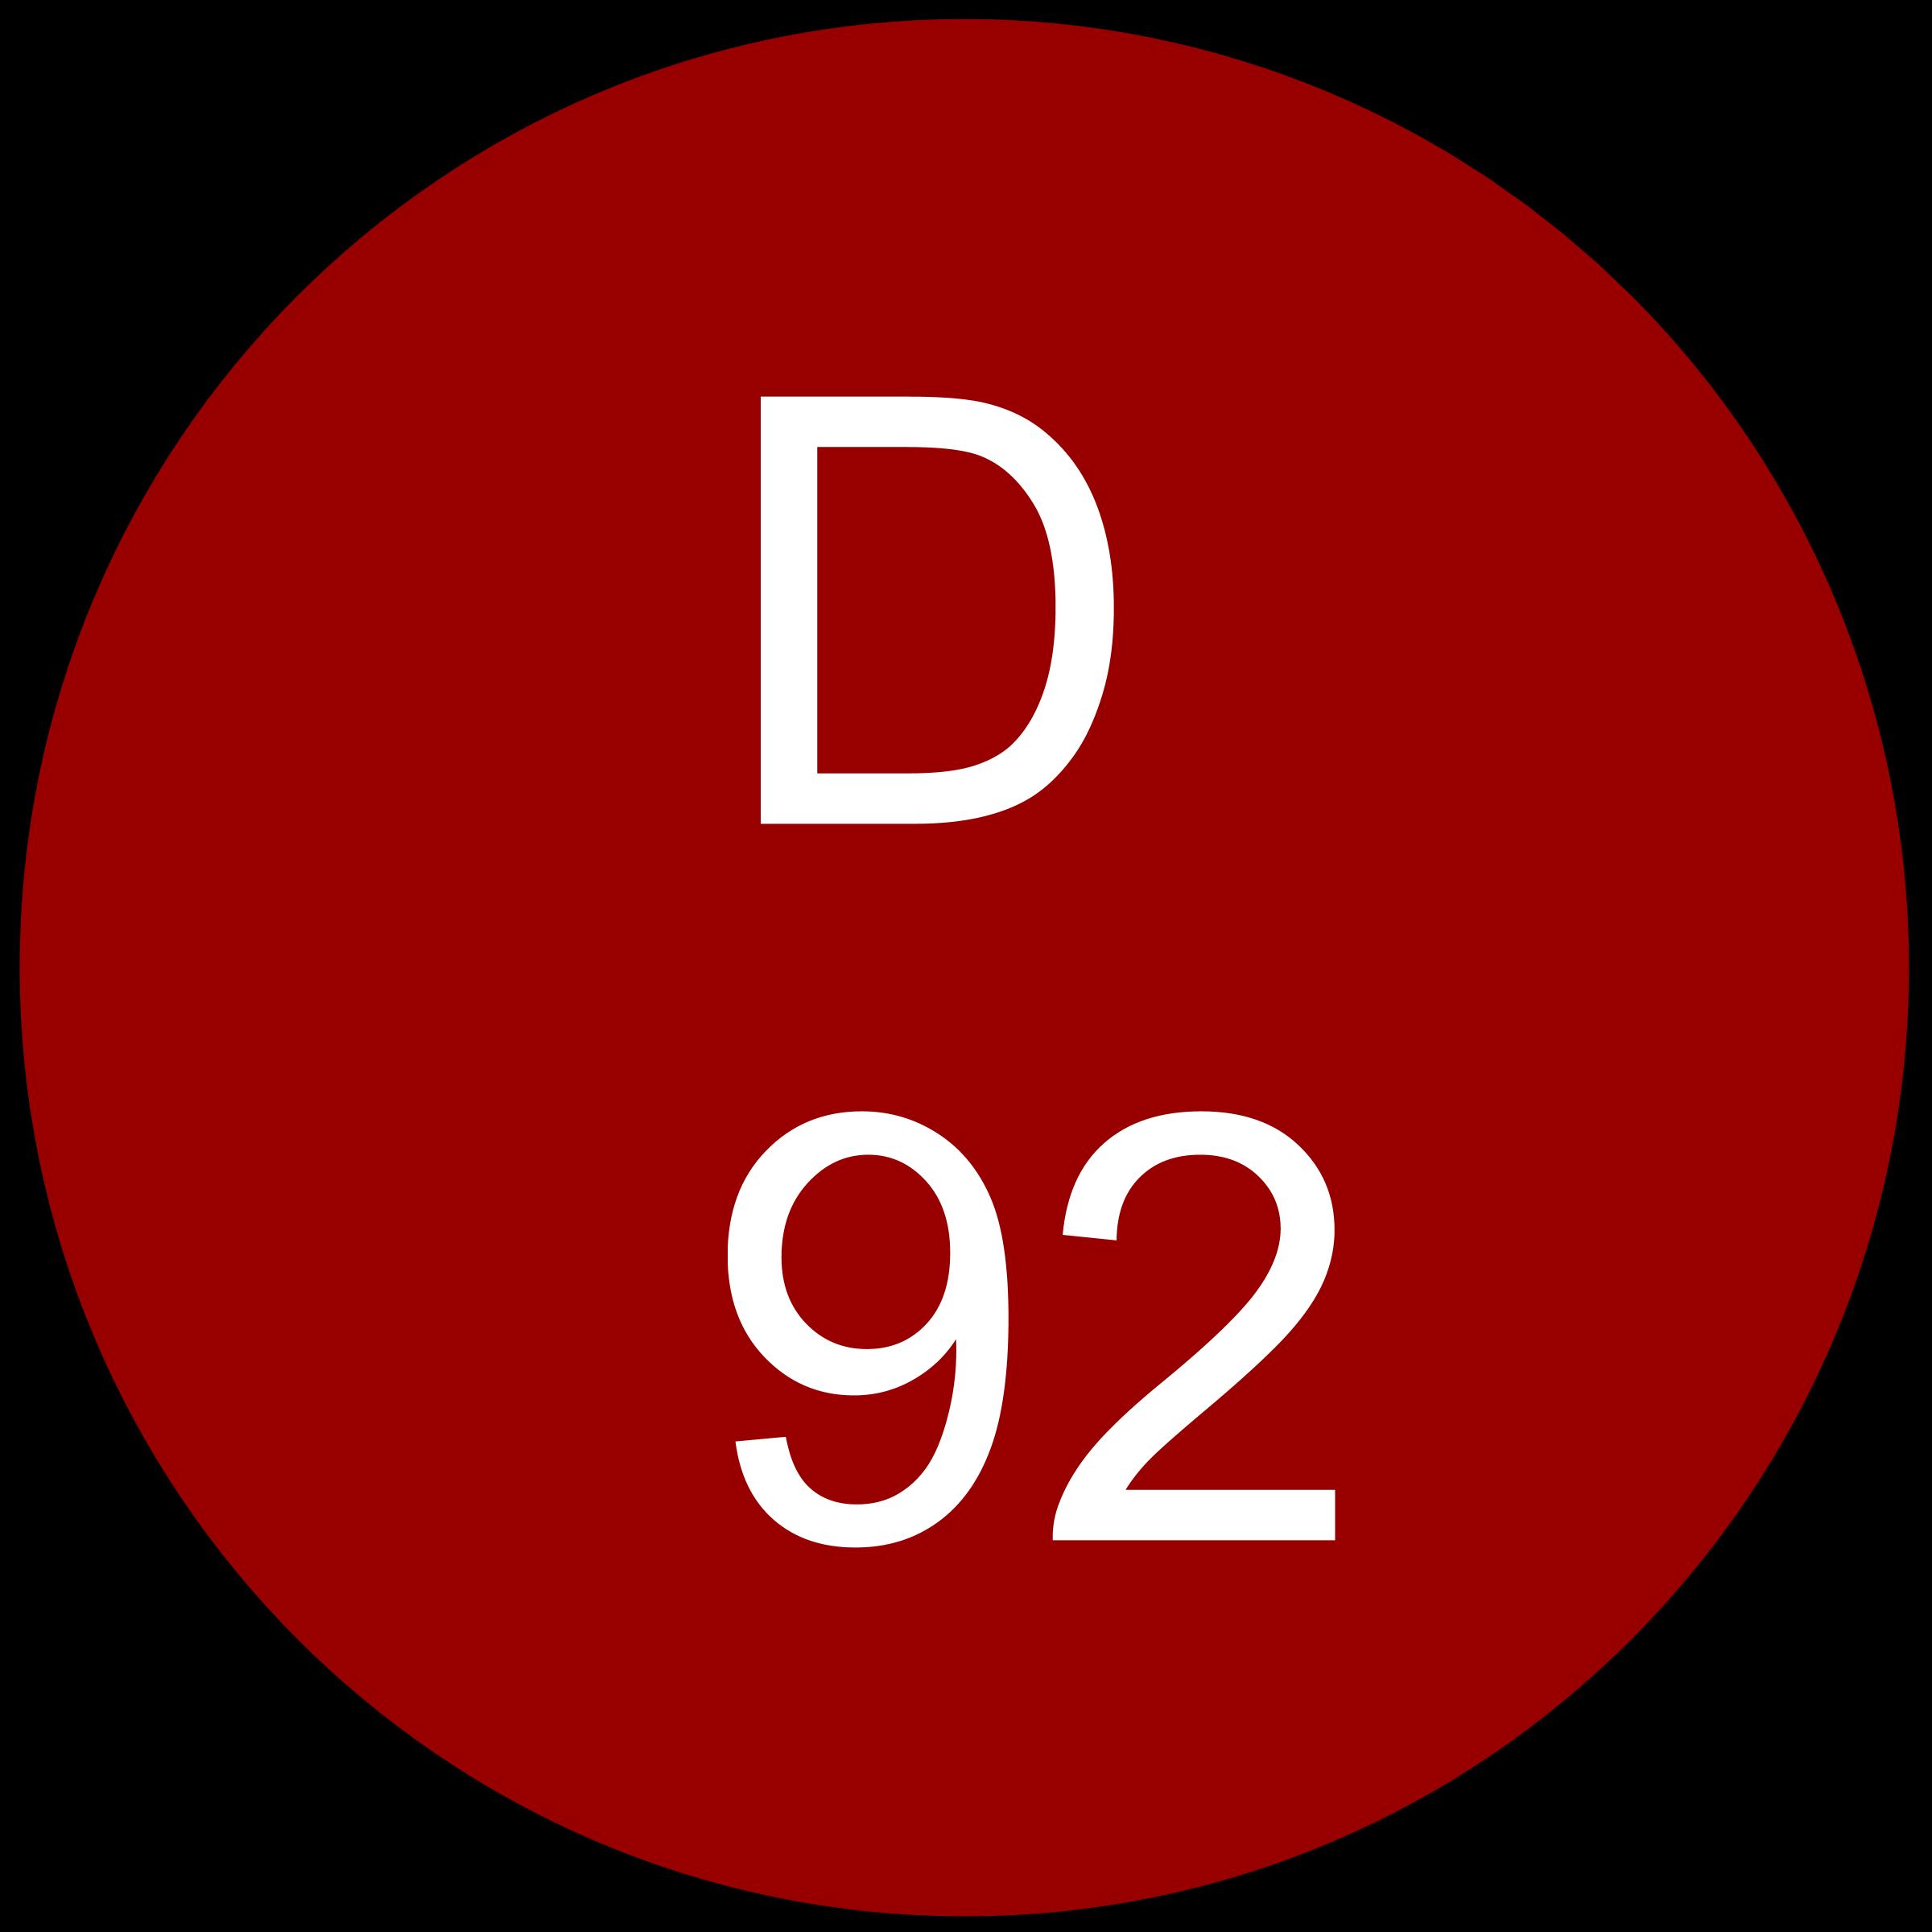 decanter-92